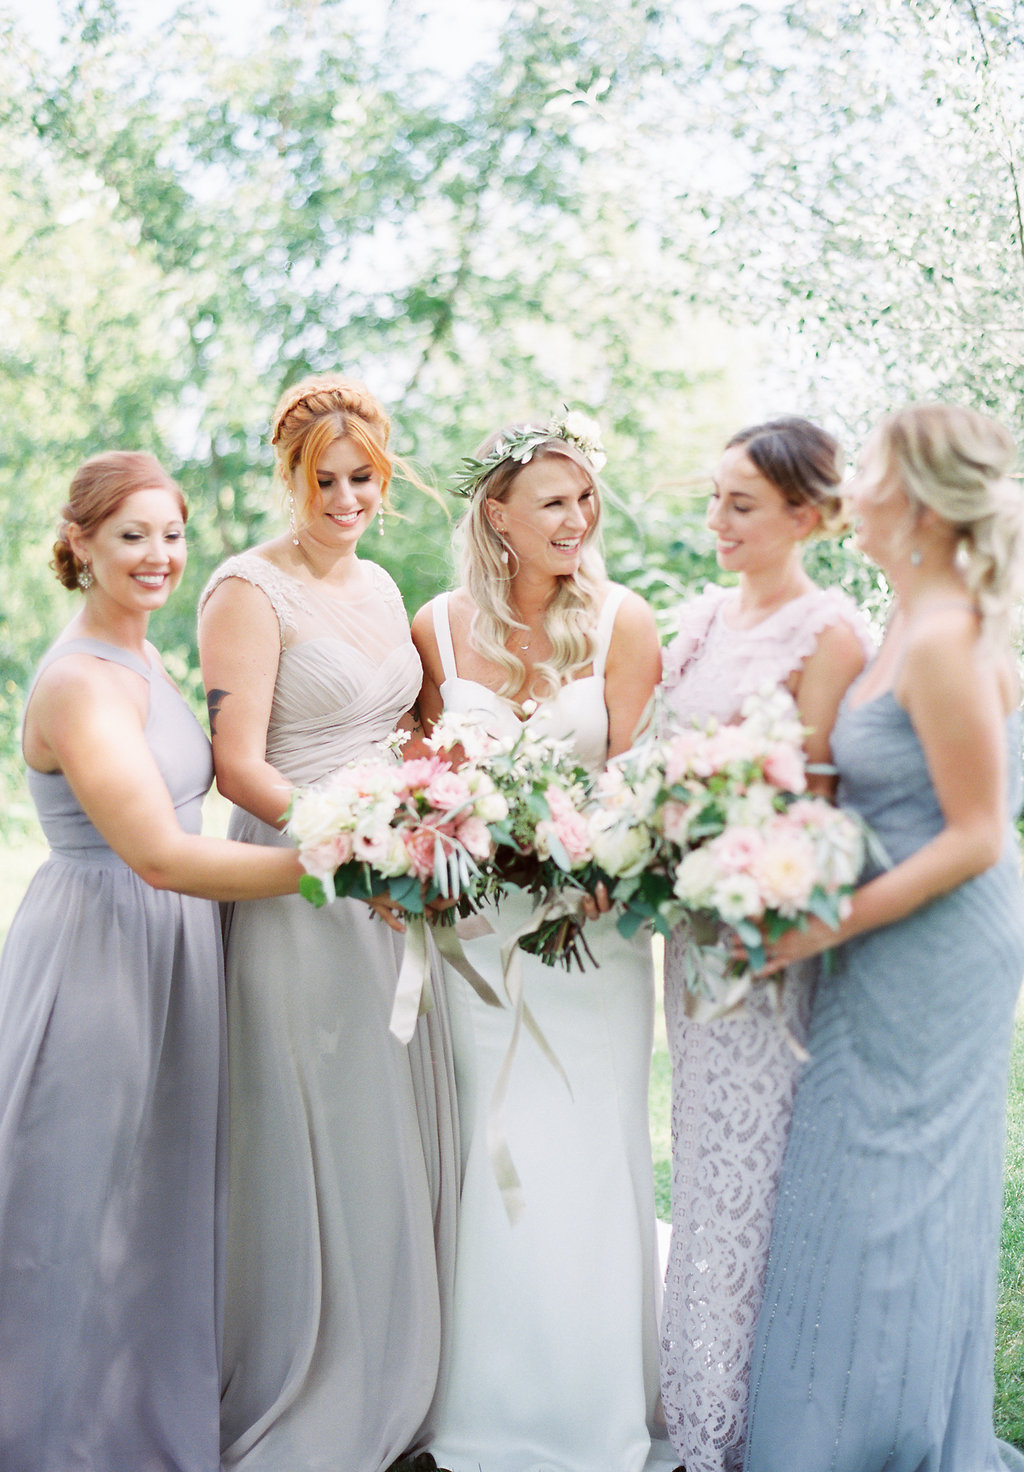 Mismatched Bridesmaid Dresses - Unicorn Wedding Ideas